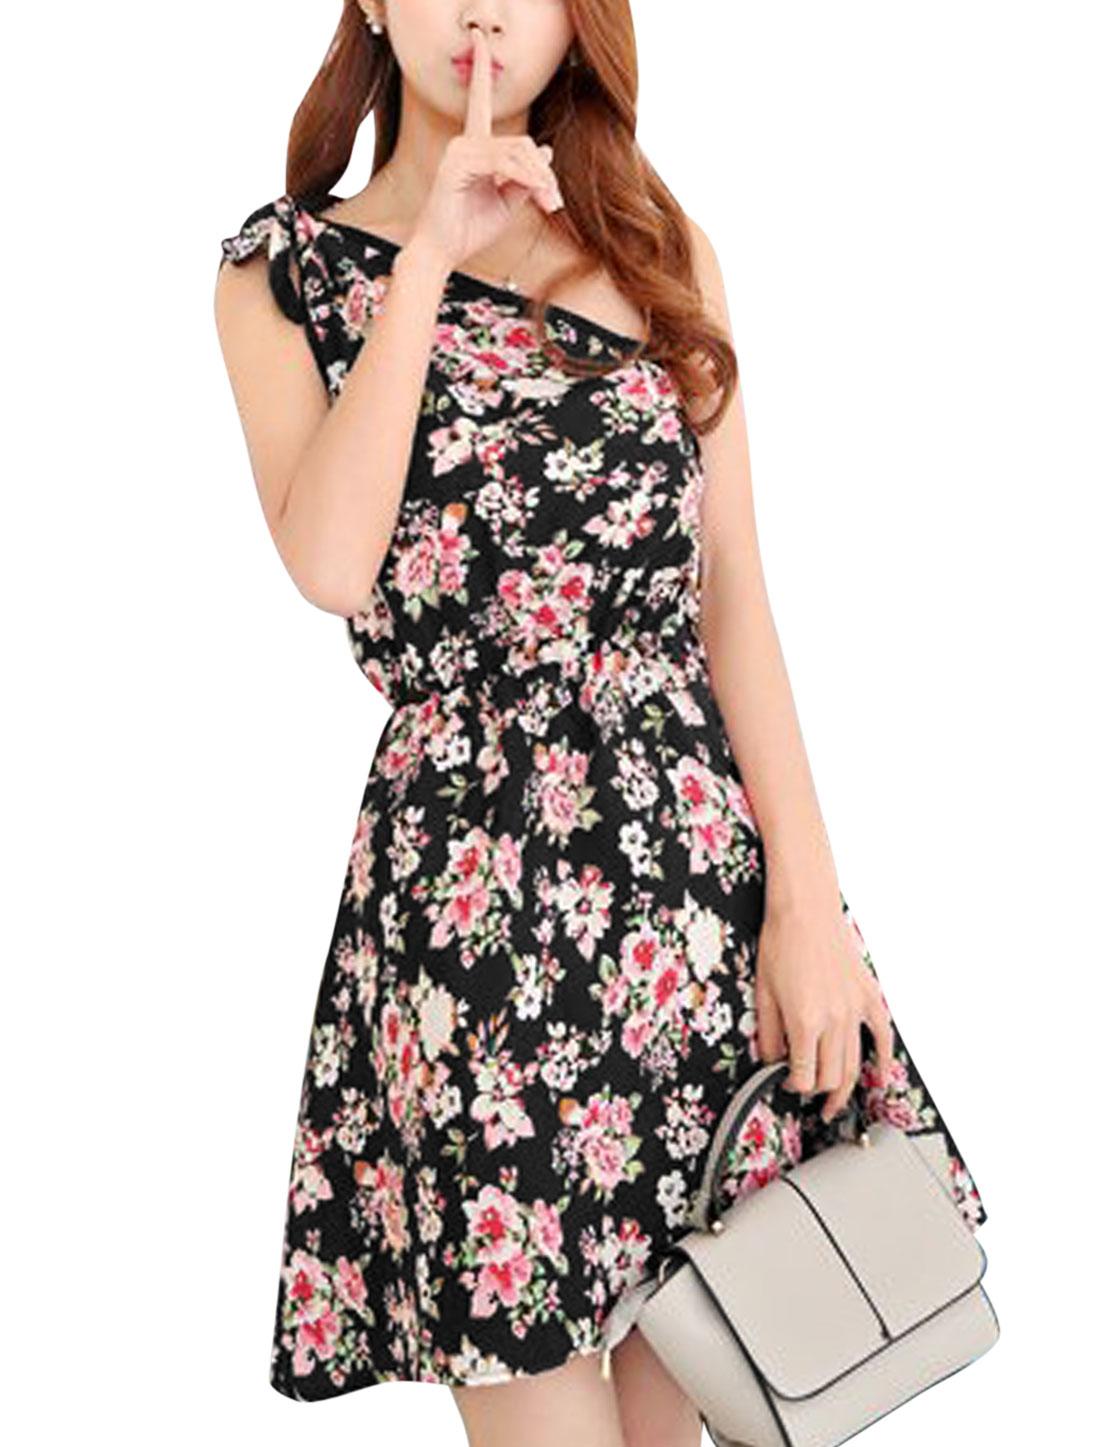 Women Elastic Waist Floral Print Self Tie Shoulder Summer Dresses Black Pink XS